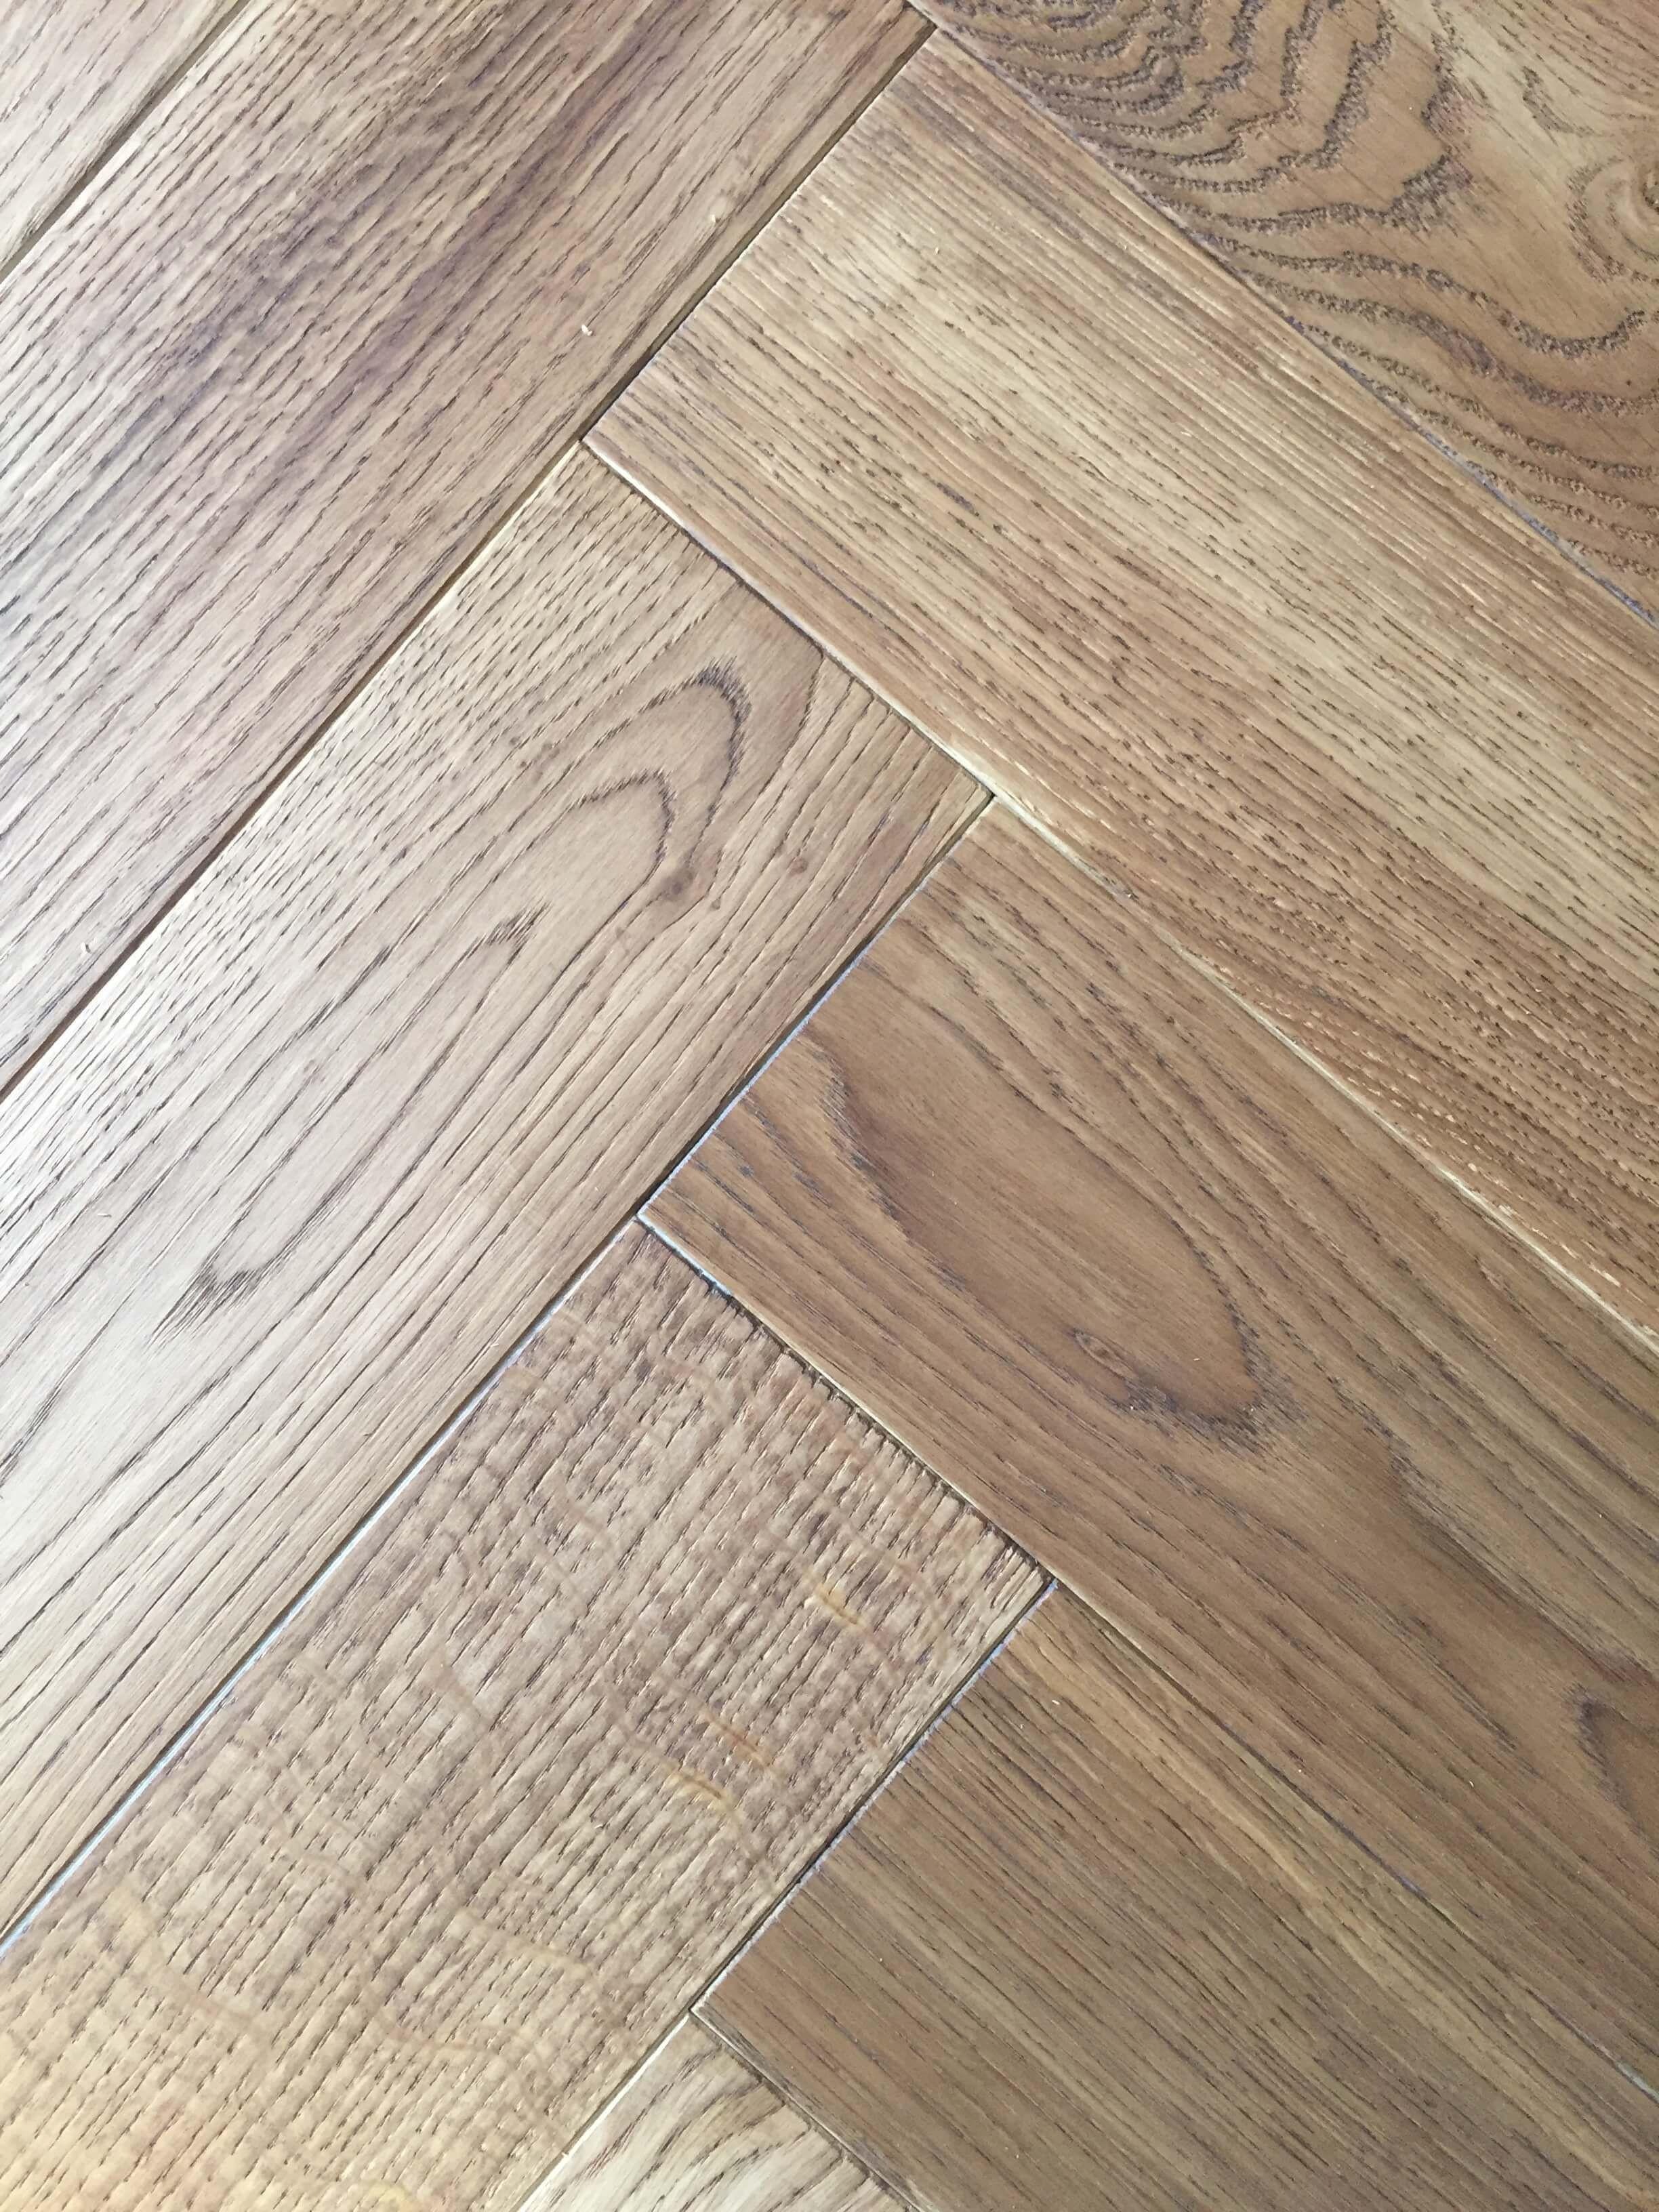 Great Hardwood Floor Repair Long Beach